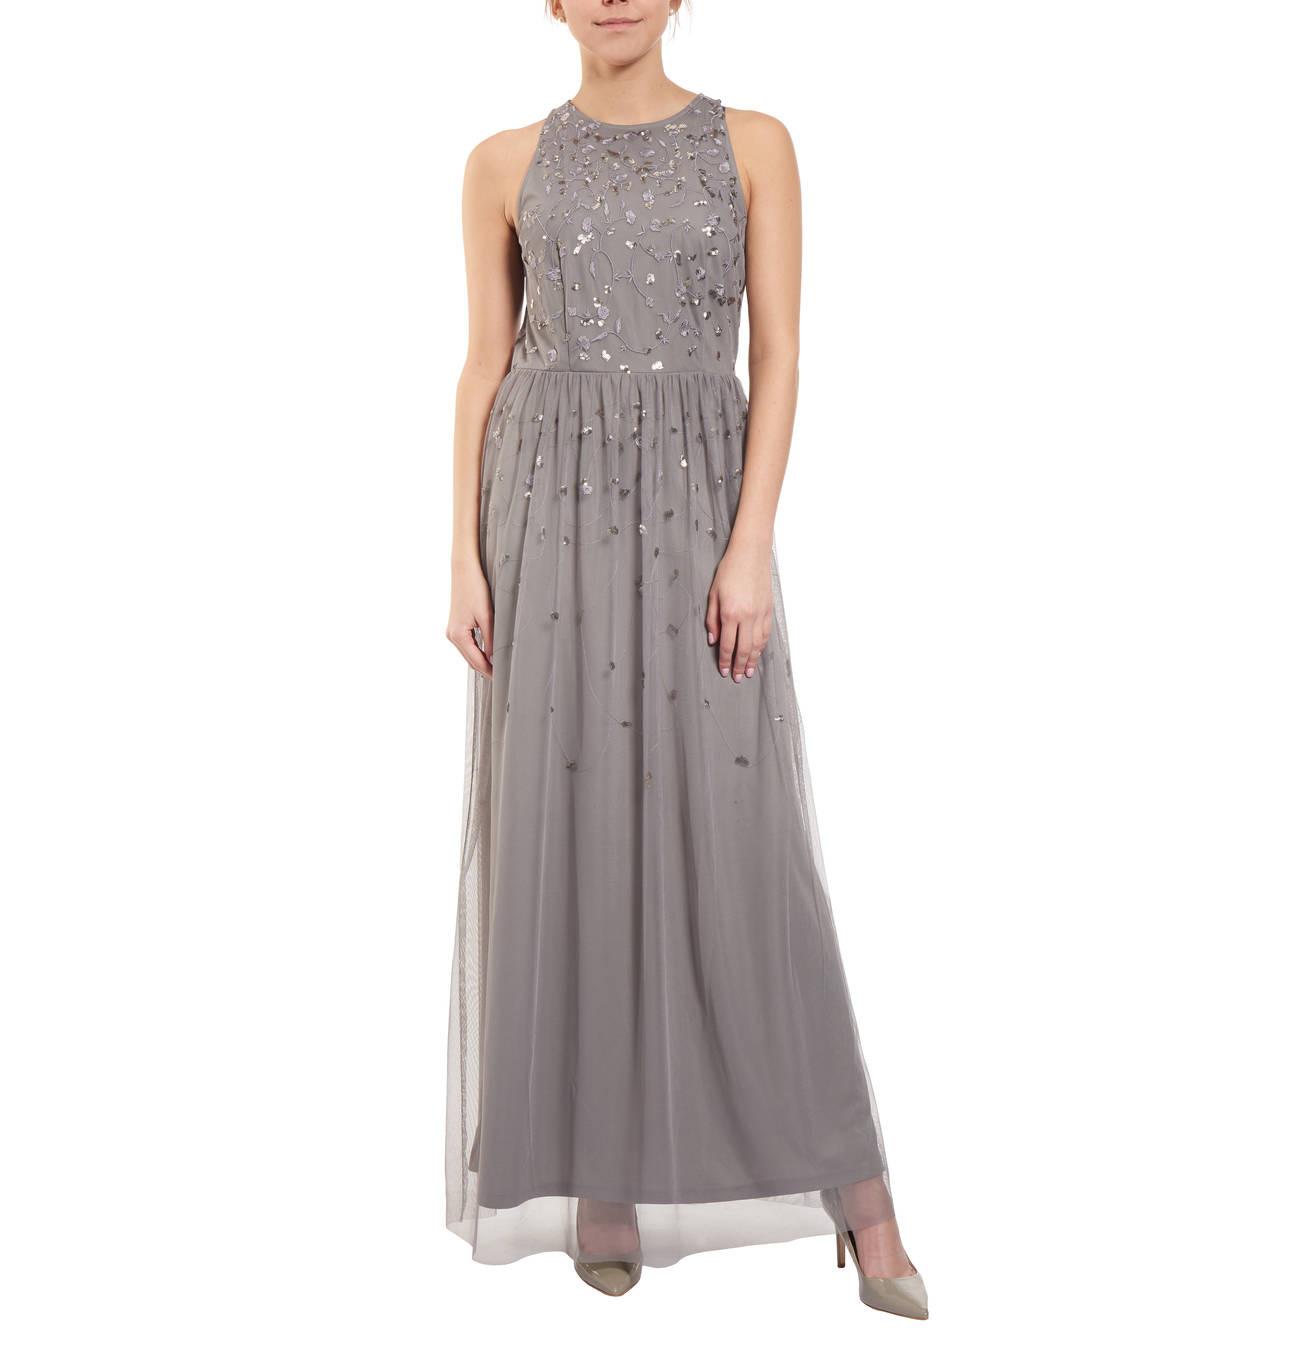 11 Spektakulär Esprit Abendkleid Ärmel - Abendkleid